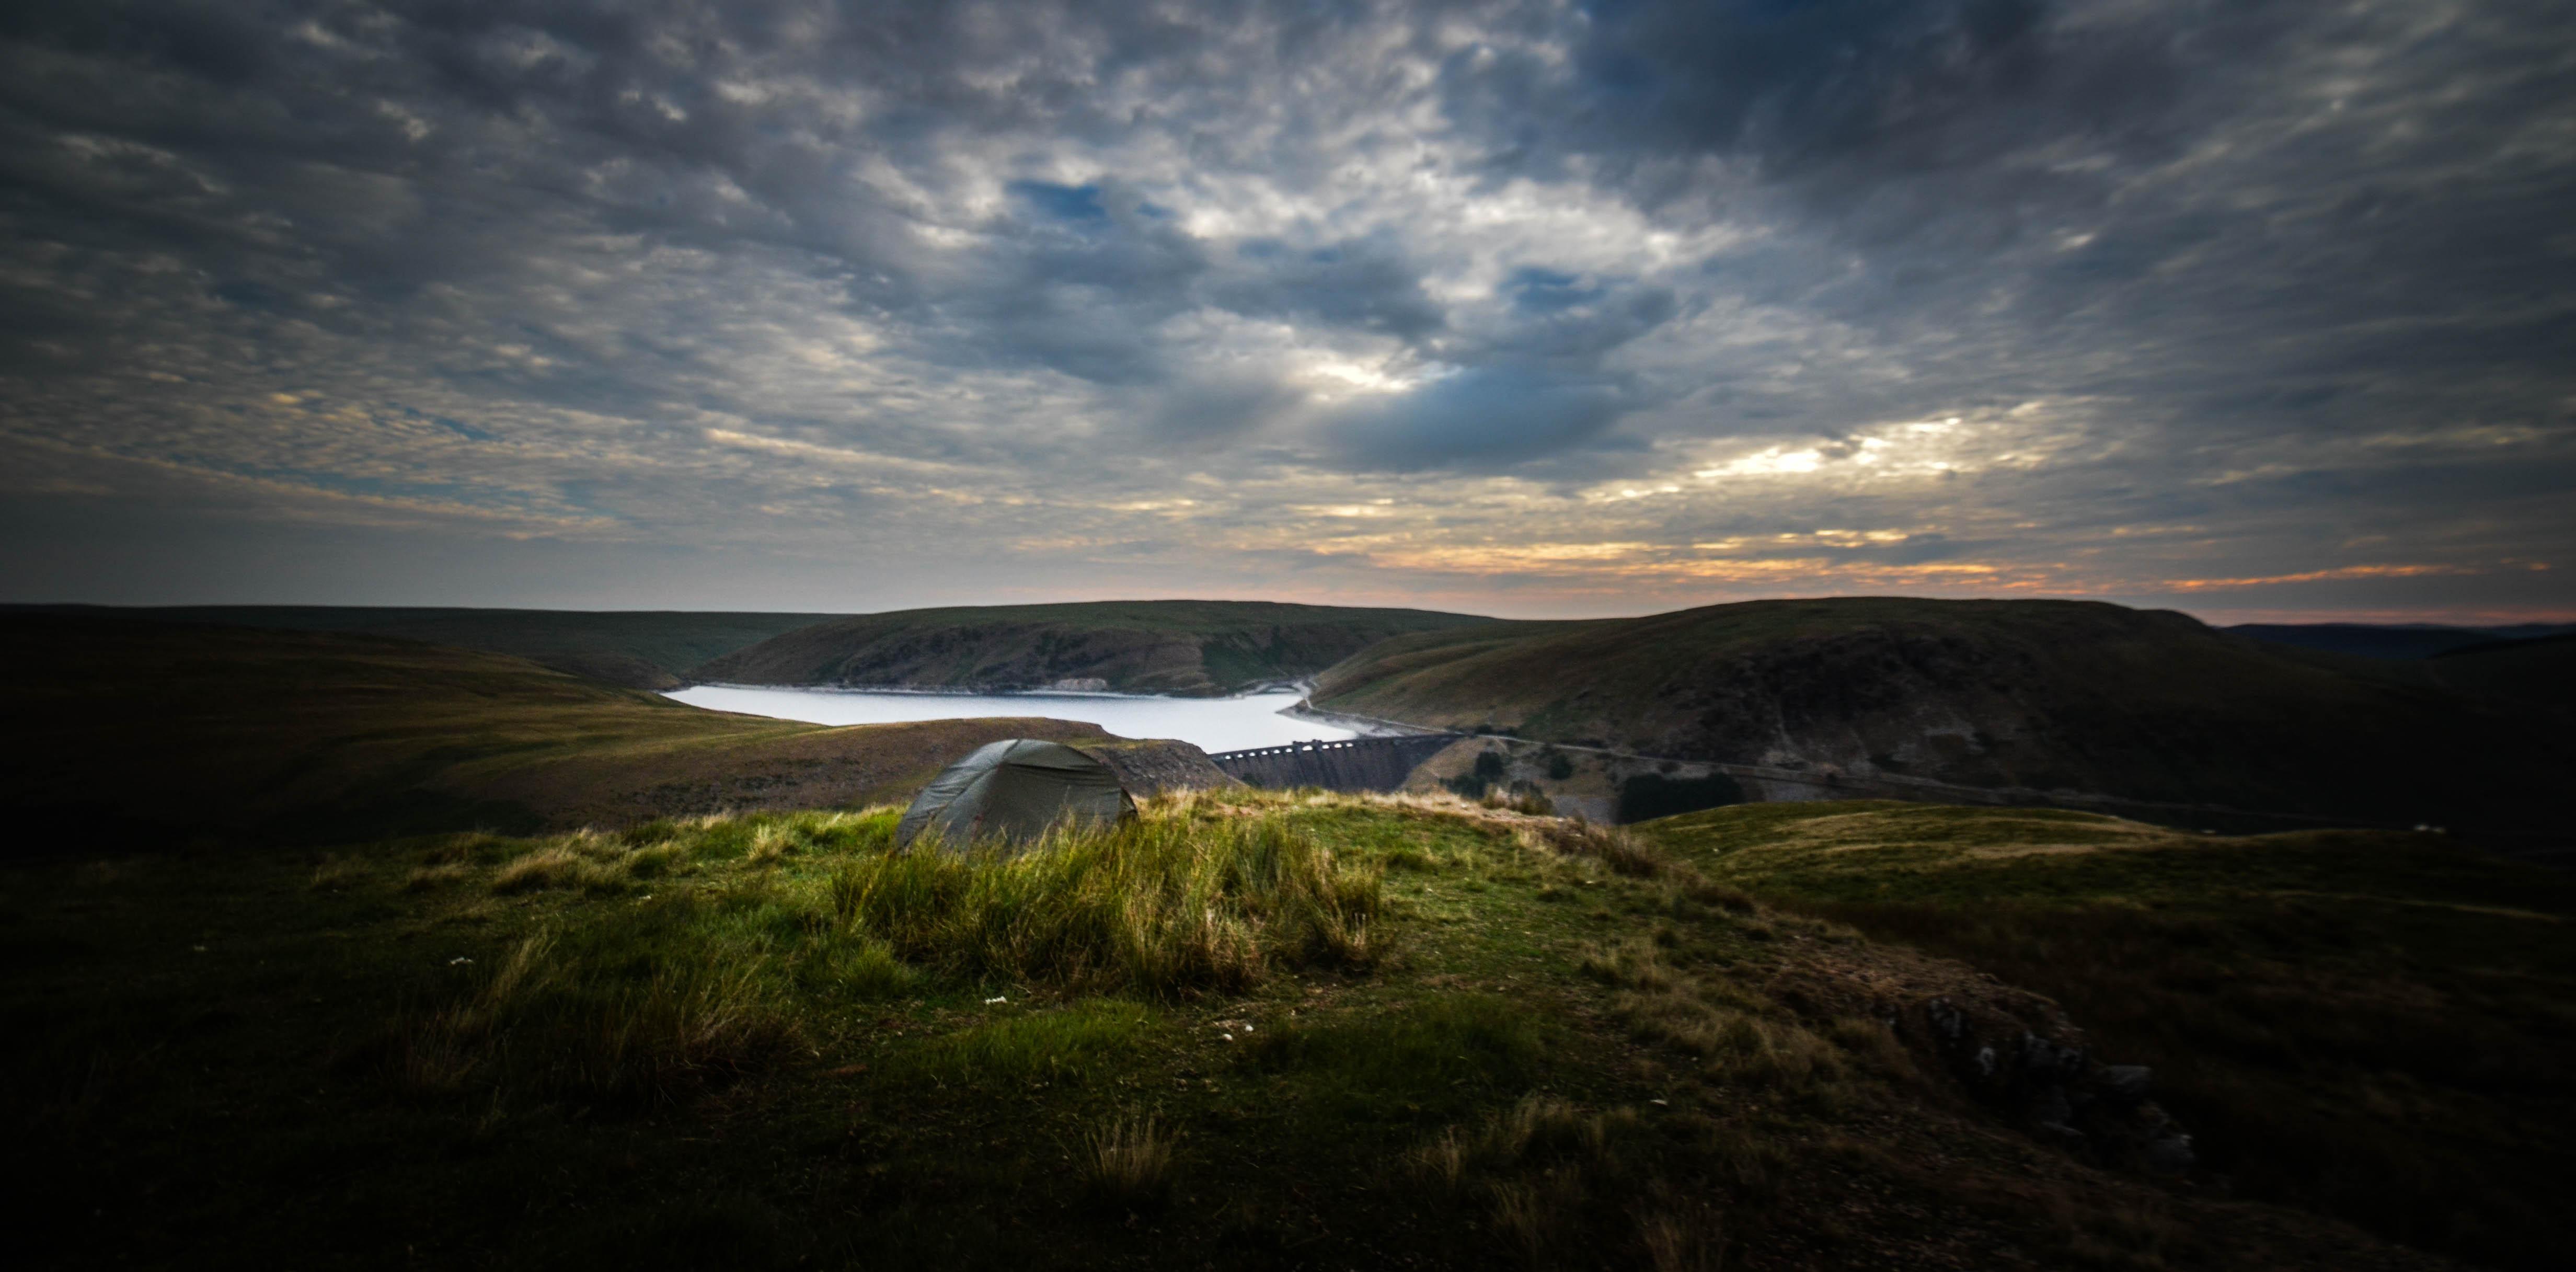 Wild camping in Elan Valley via@henwickcharlie | Land Rover Explore